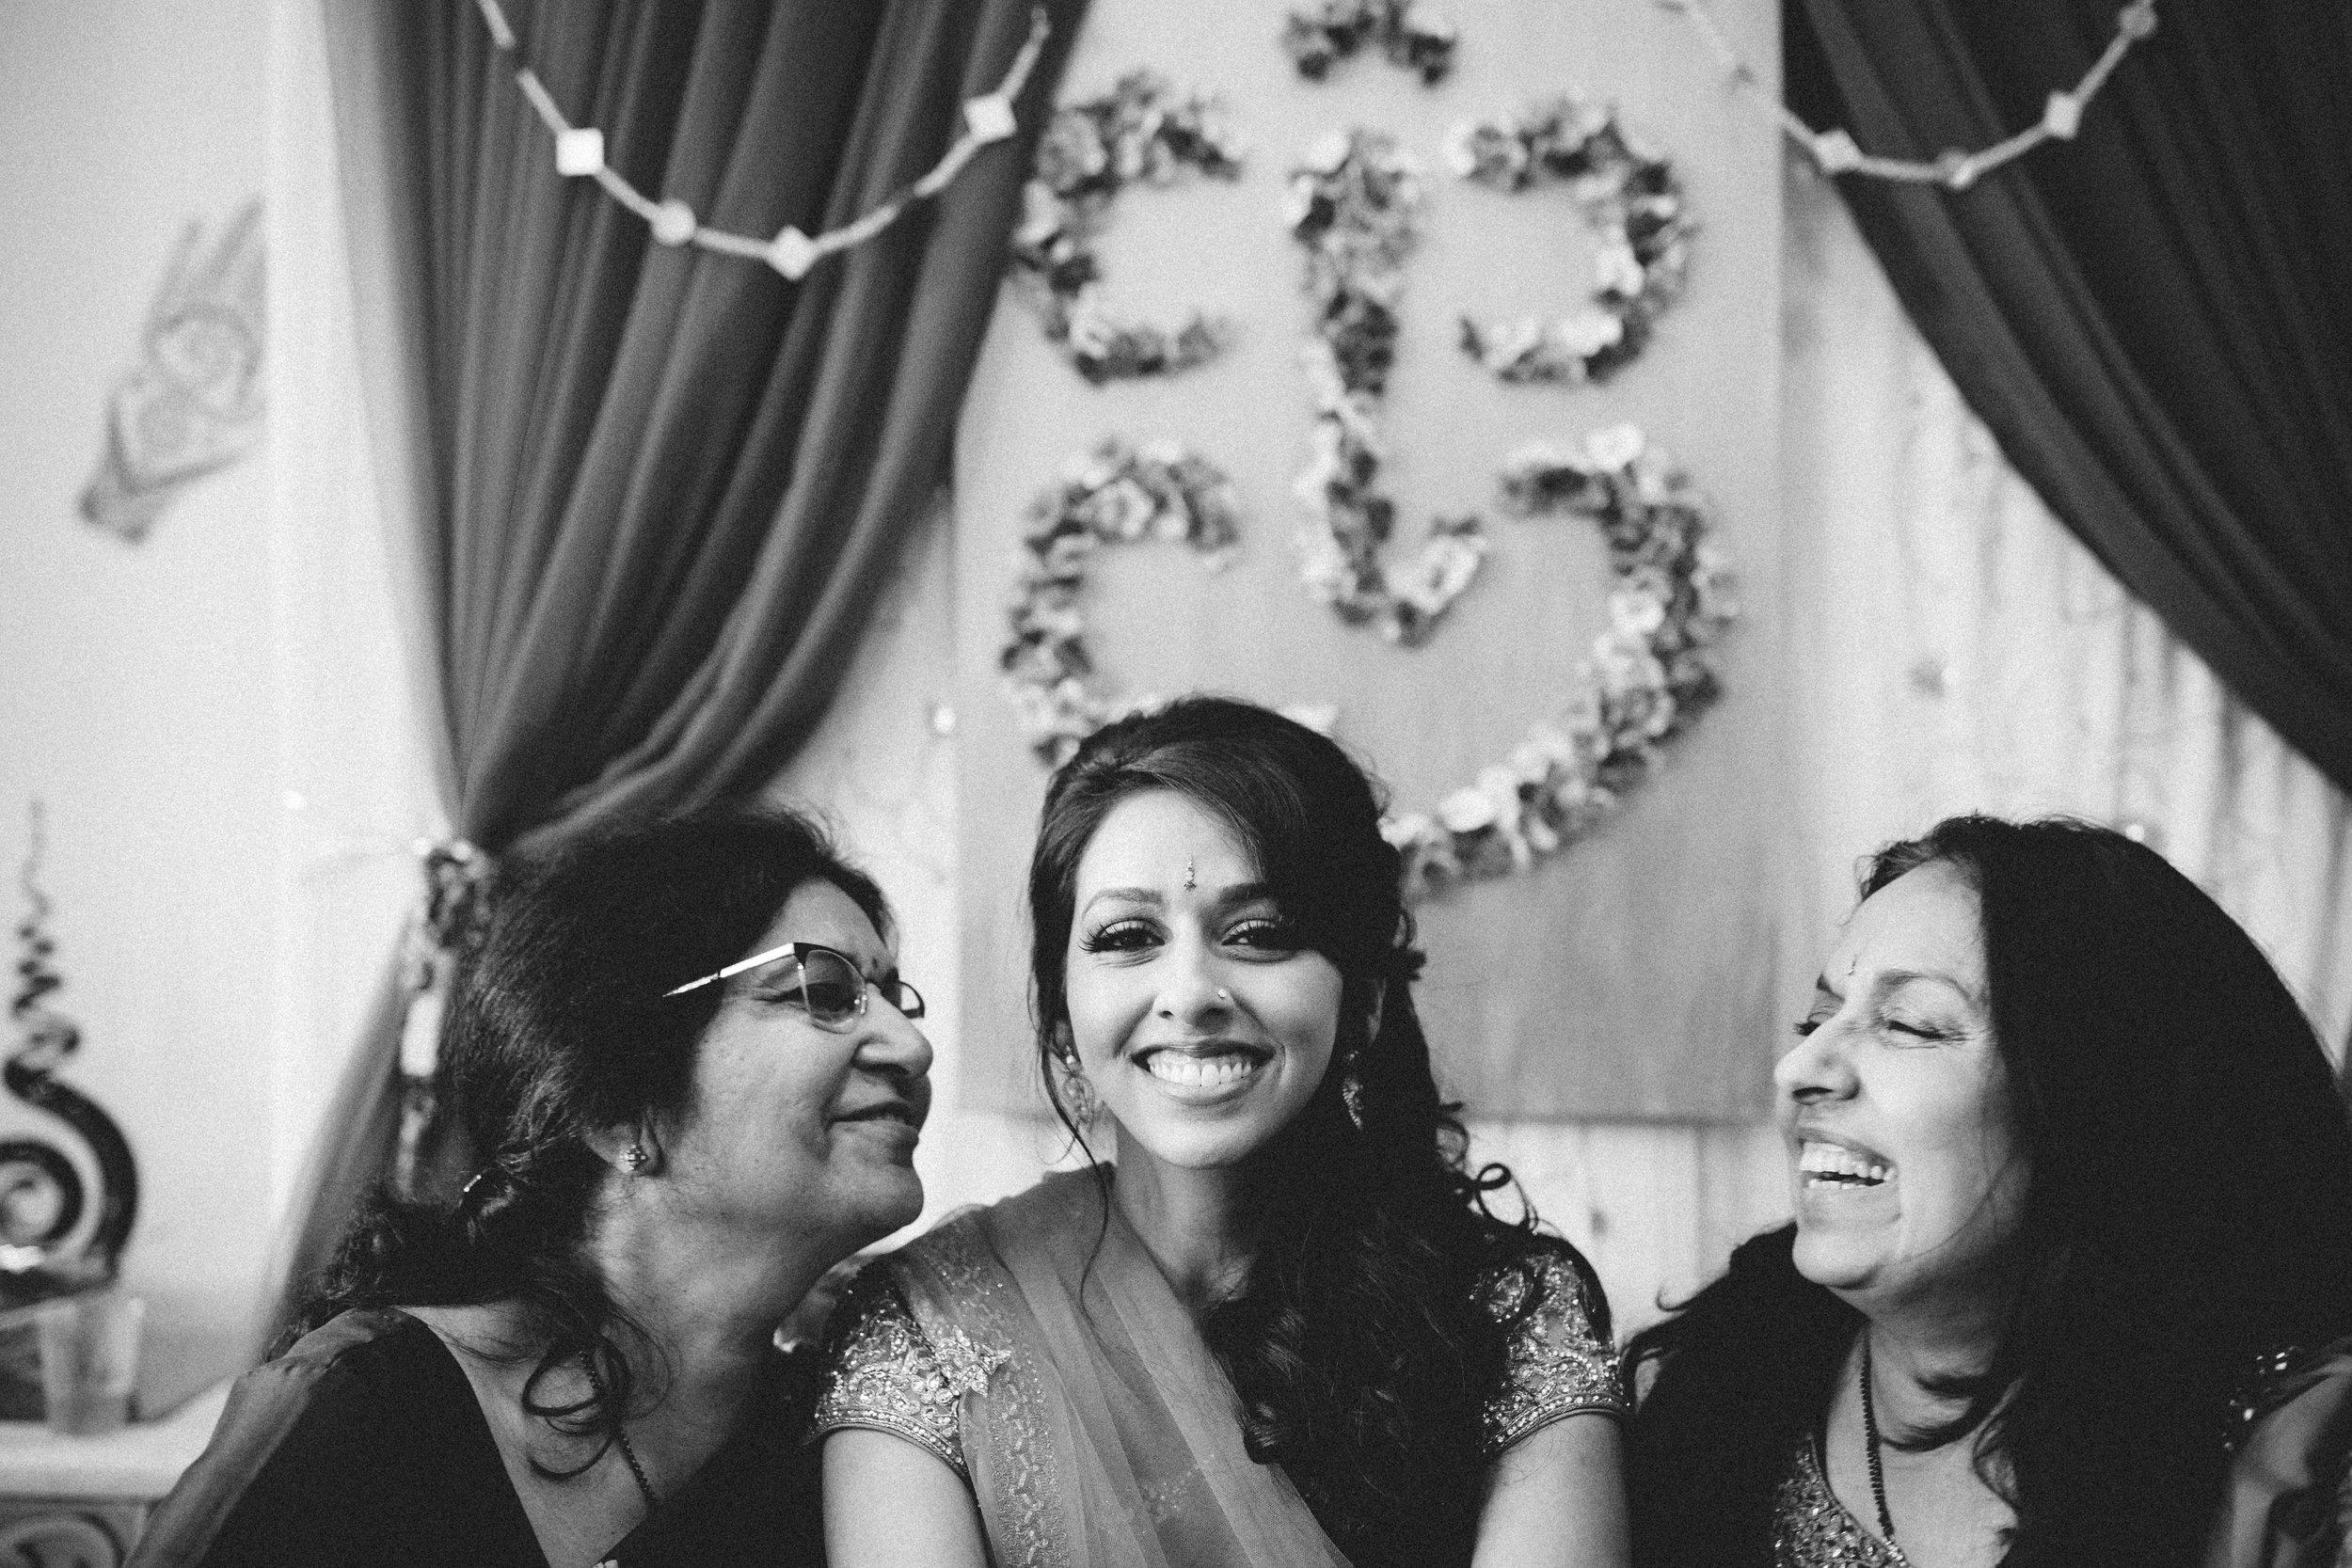 Aparna-Ankit-Patel-Mehndi-Wedding-Photos-0061.jpg